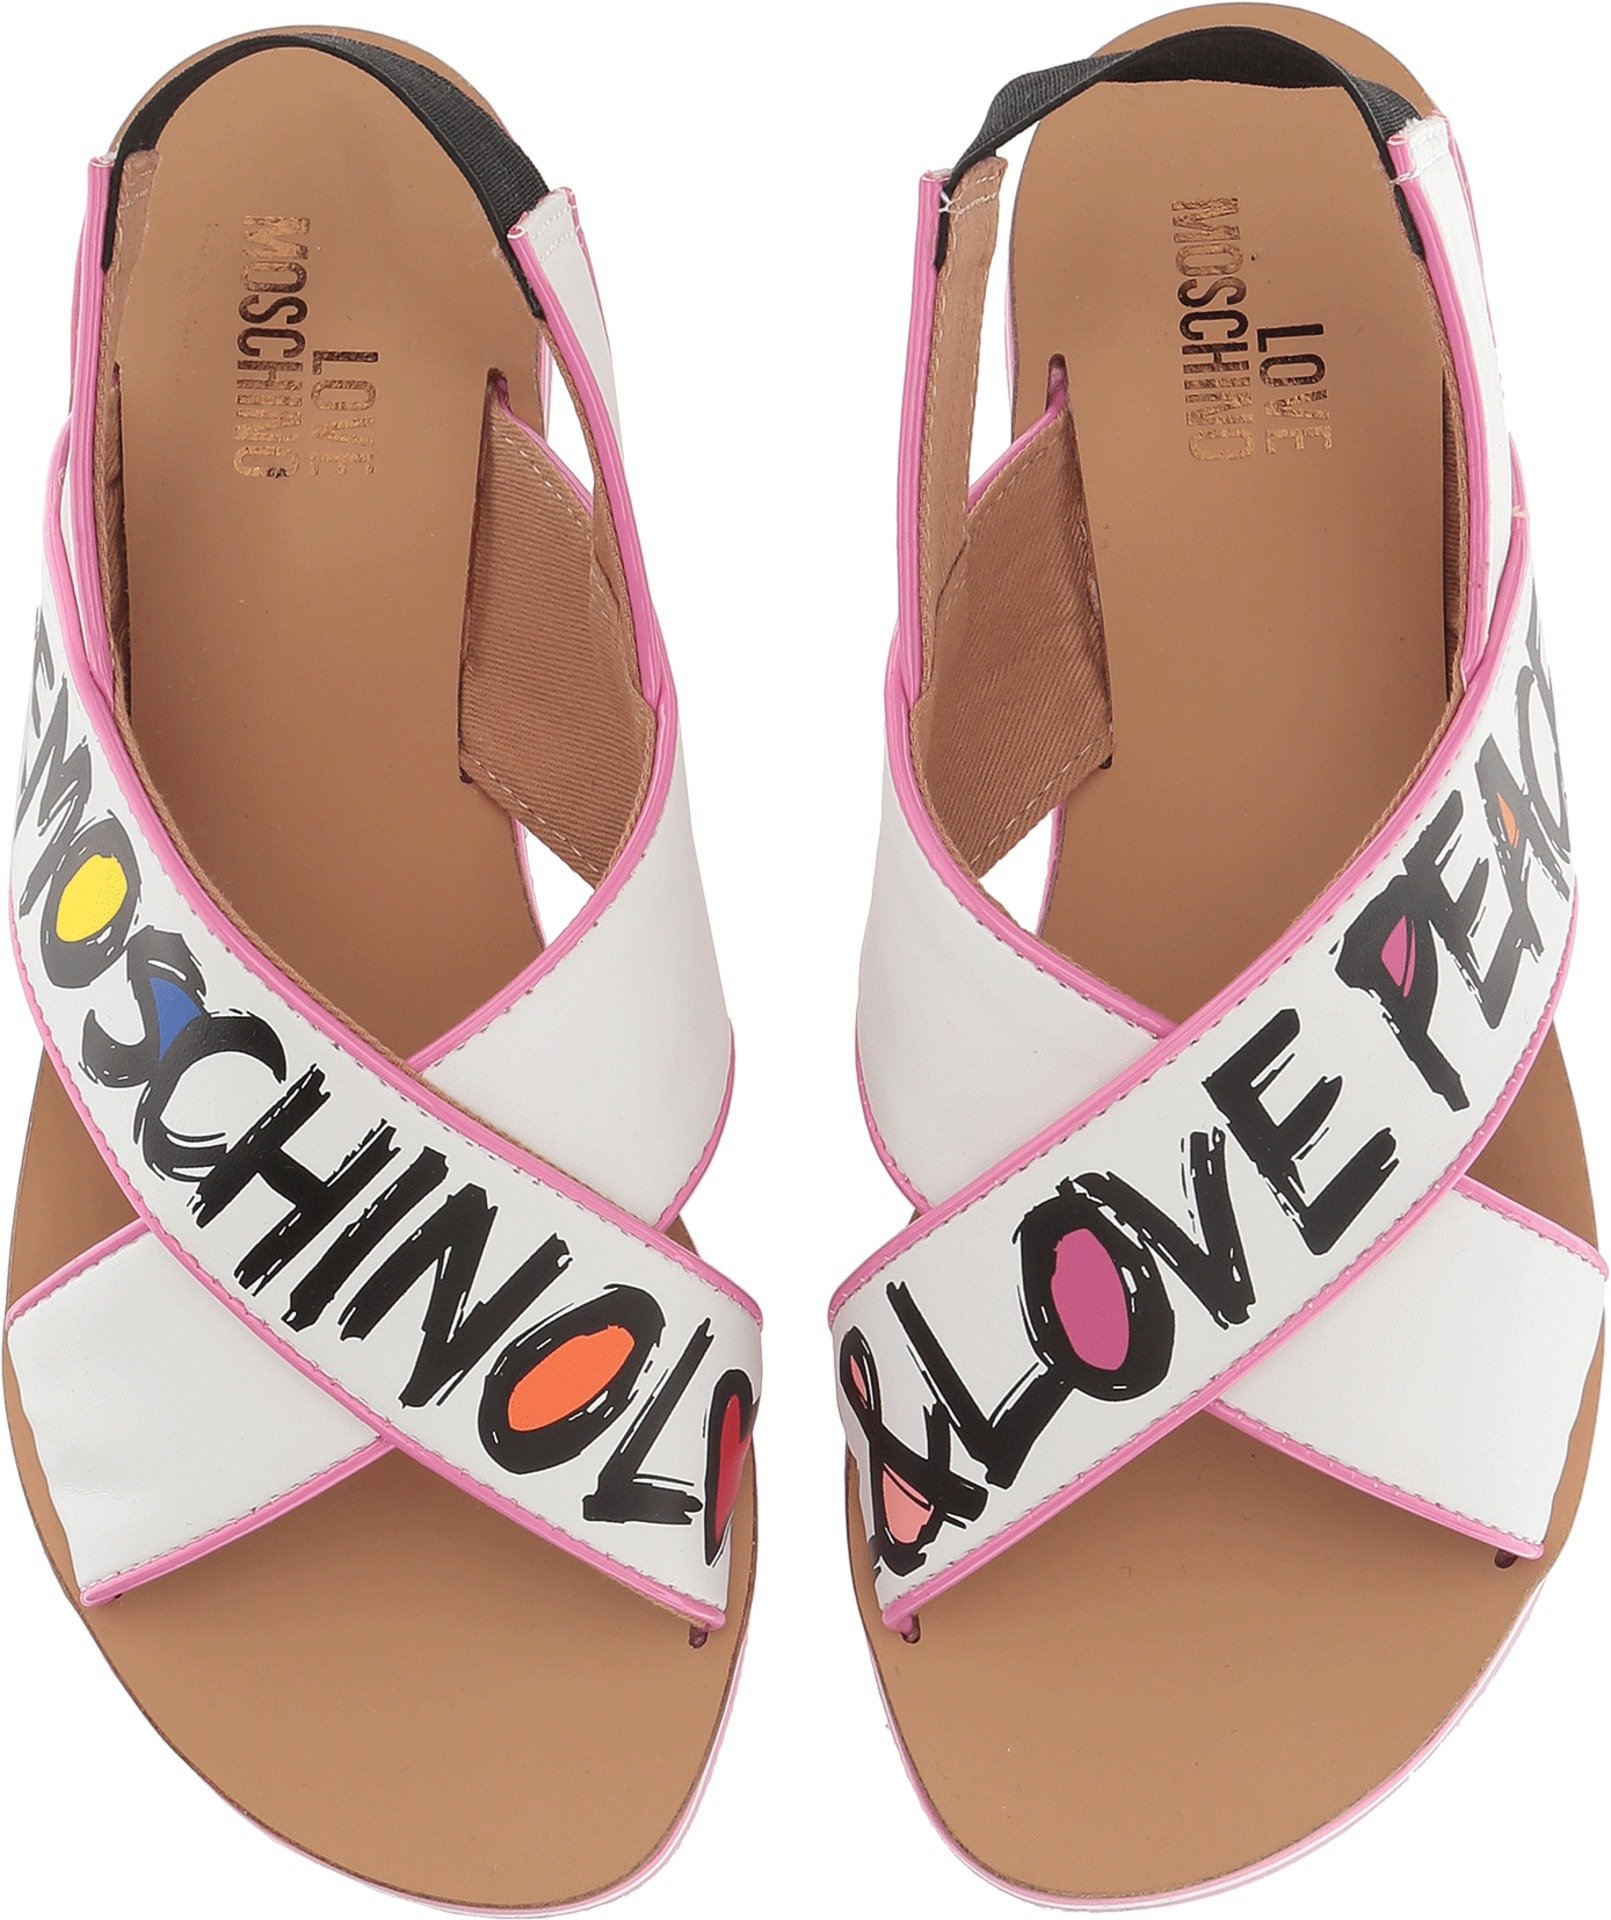 Love Moschino Women's Sandal Pink 38 M EU